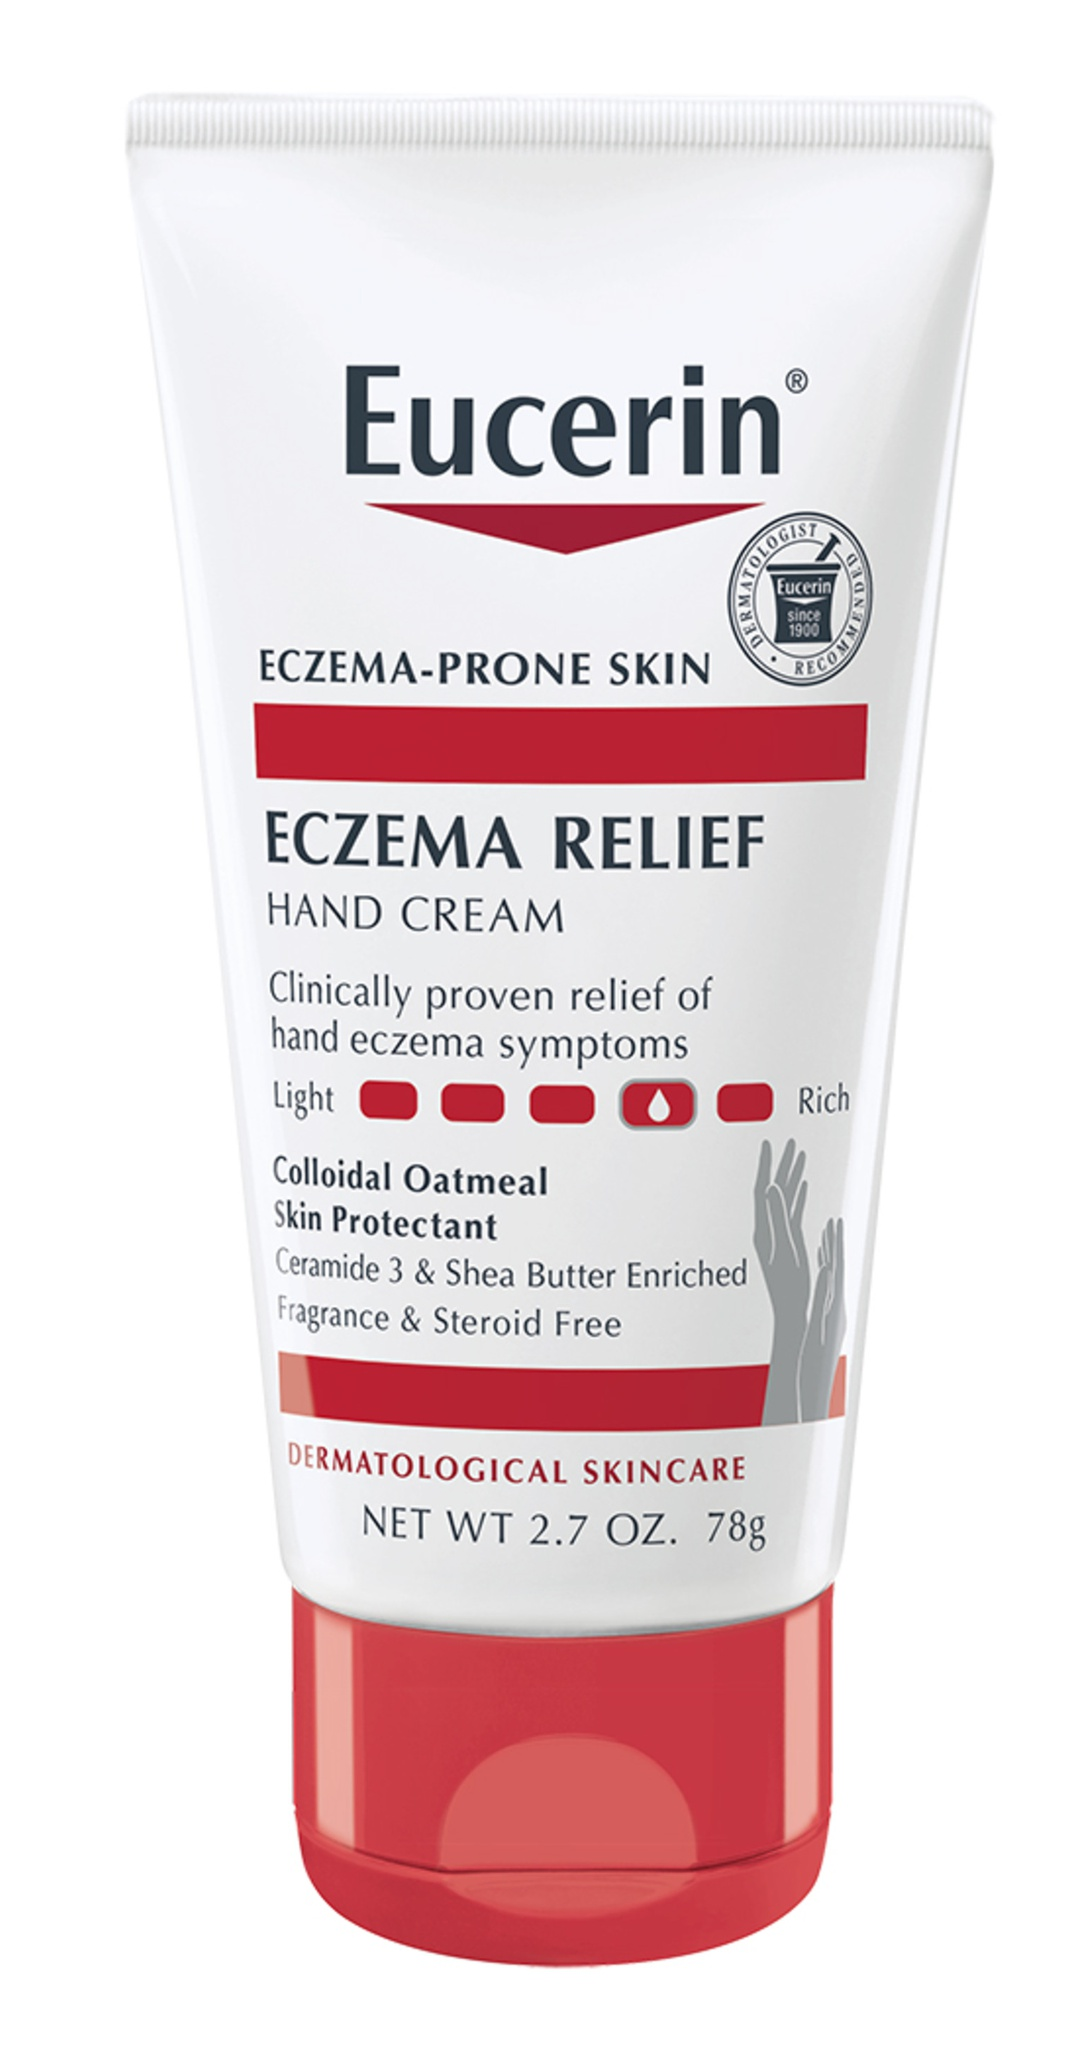 Eucerin Eczema Relief Hand Cream